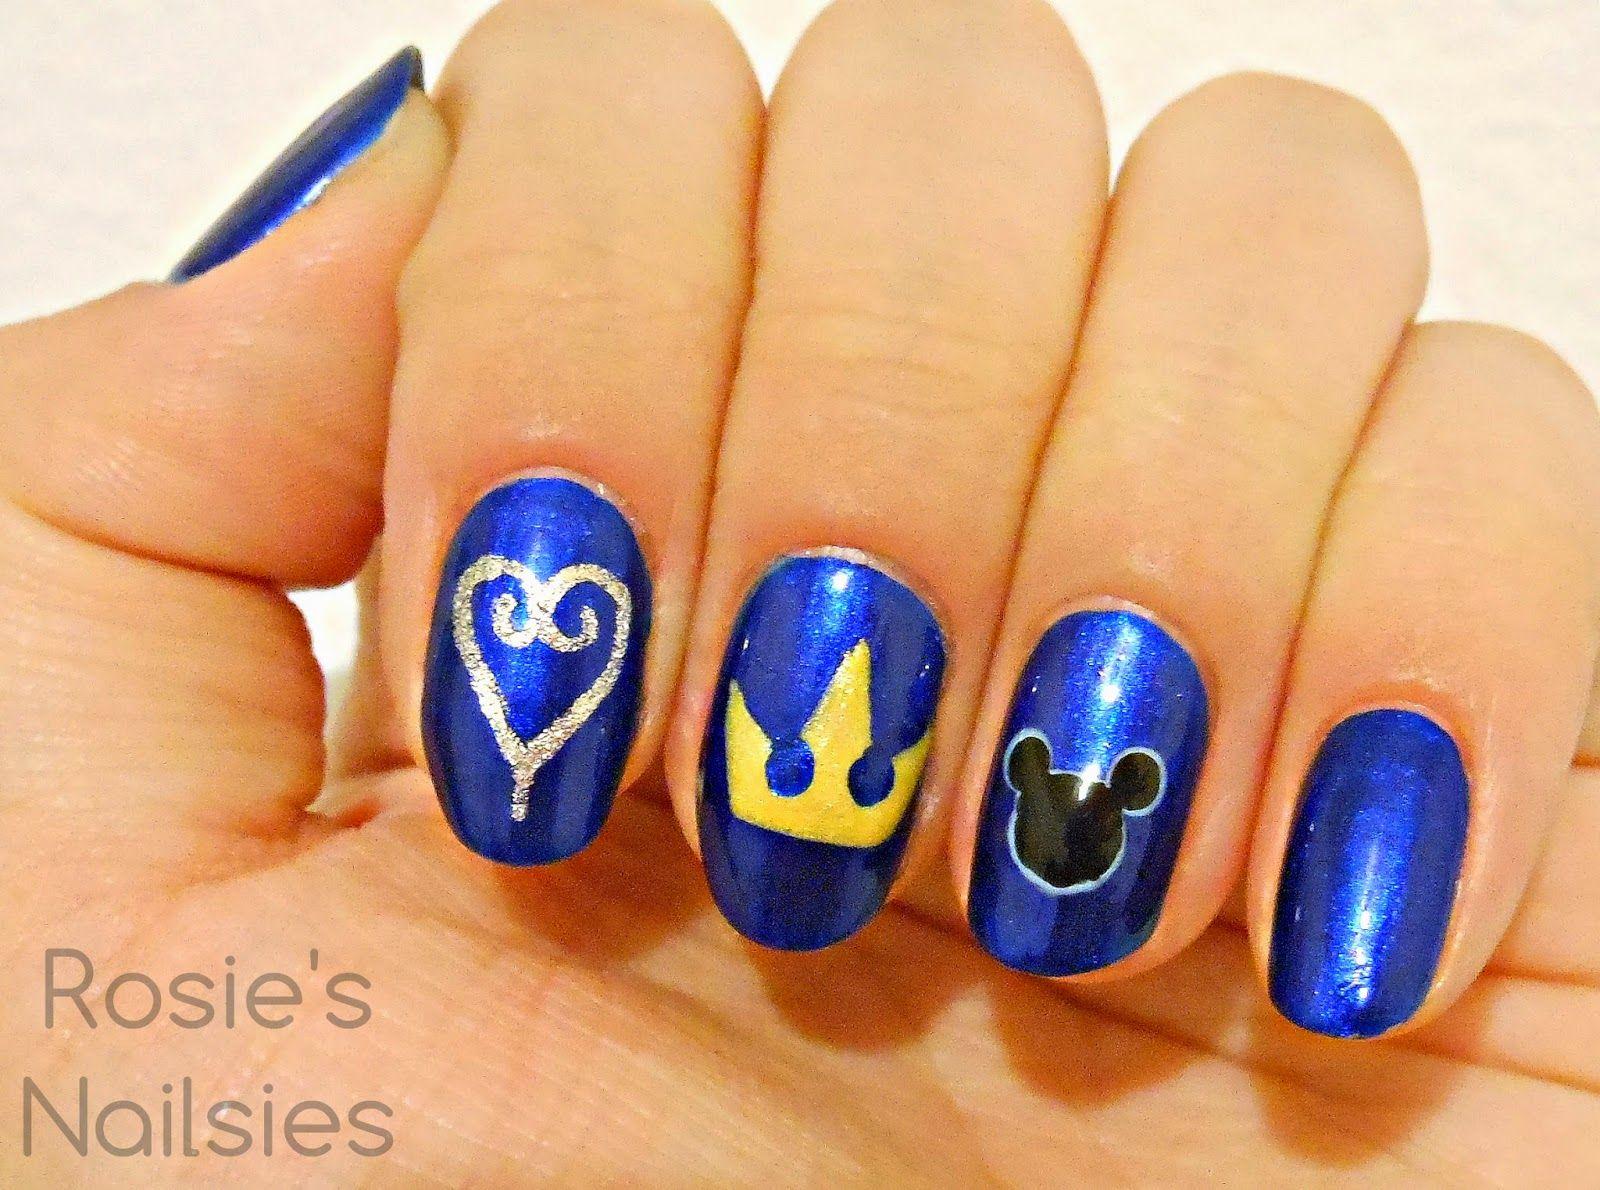 kingdom hearts nails - Google Search | fun | Pinterest | Makeup ...